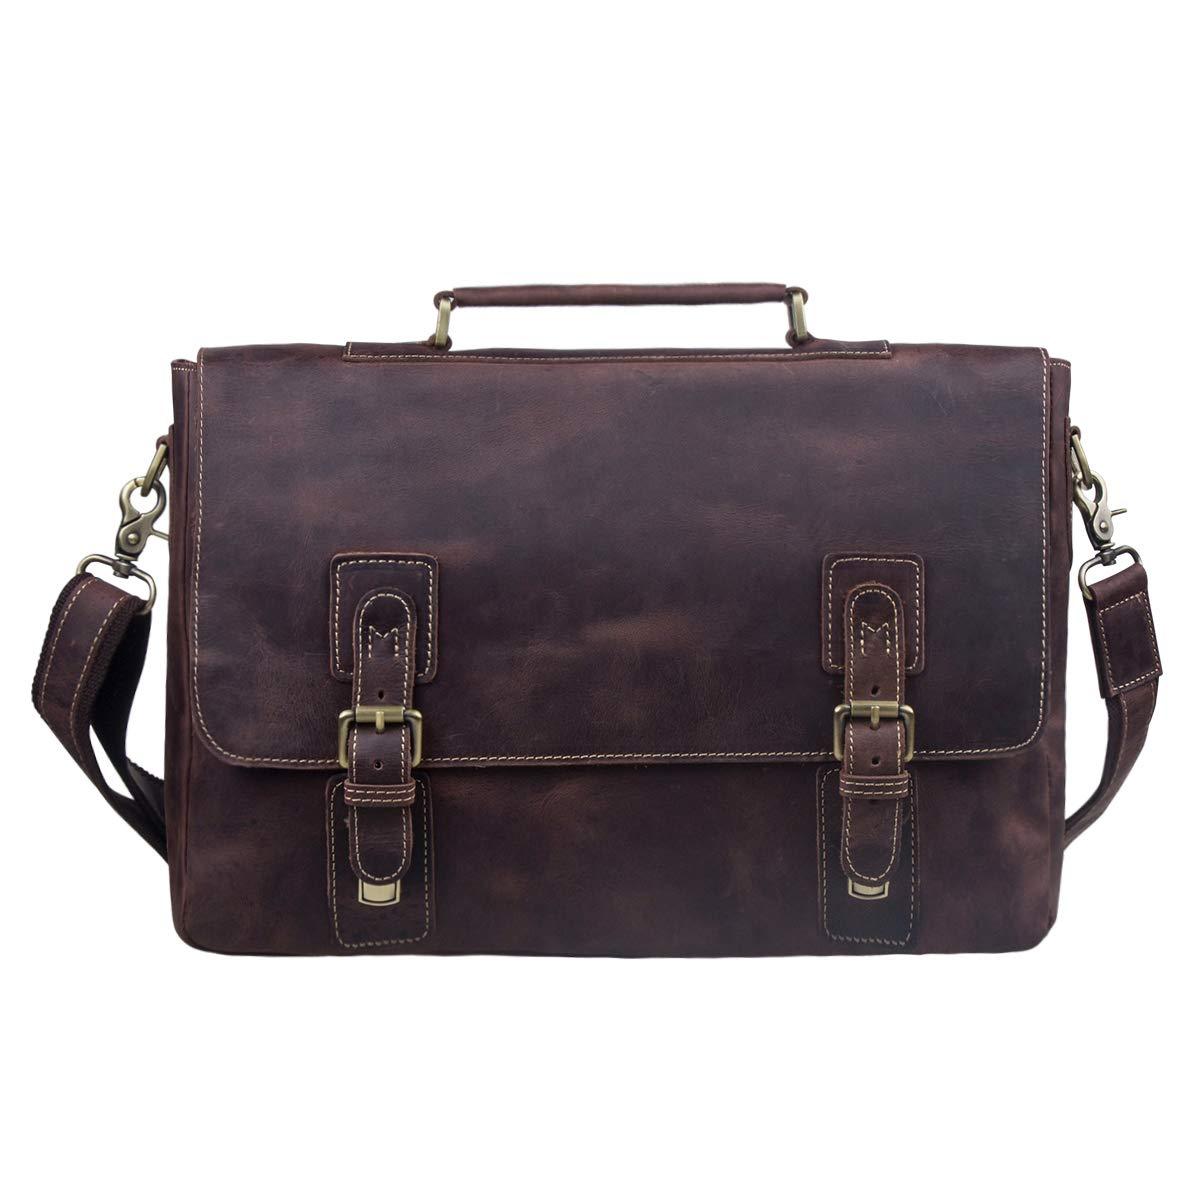 S-ZONE Men's Crazy Horse Leather Satchel Briefcase Shoulder Bag Messenger Bag 14'' Laptop Tote Bag by S-ZONE (Image #2)